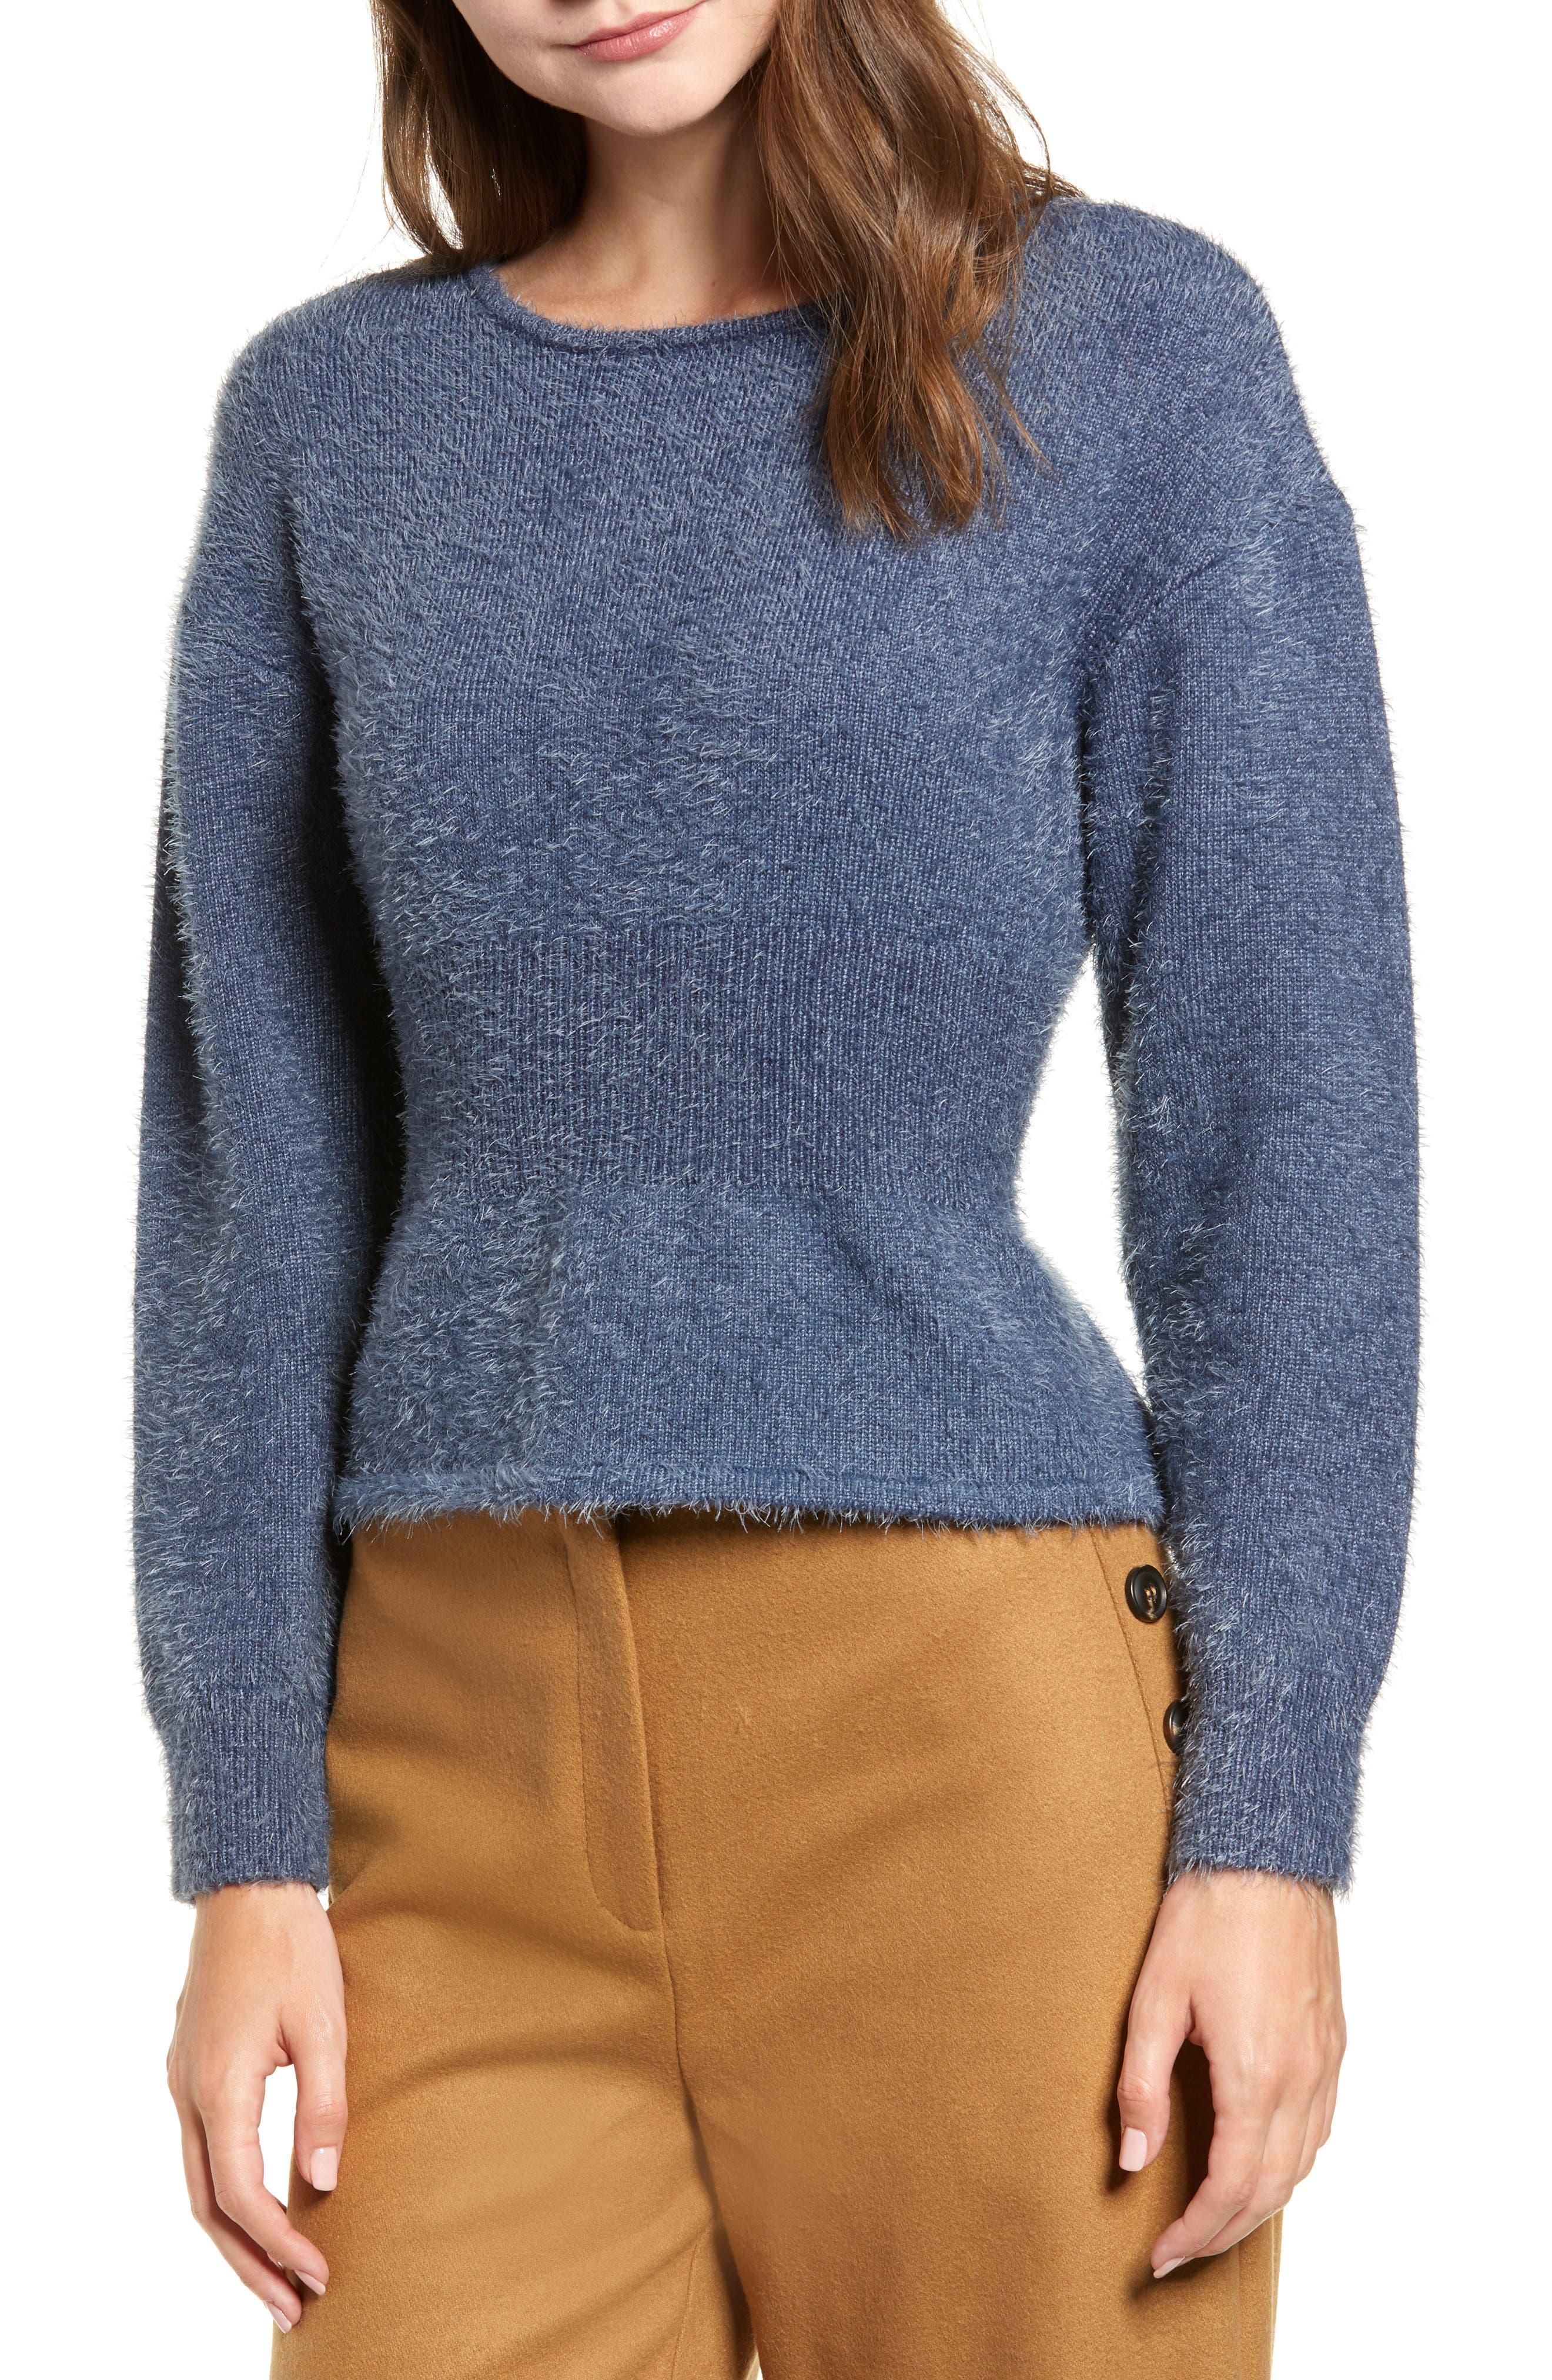 Chriselle Lim Erin Eyelash Sweater,                             Main thumbnail 1, color,                             400